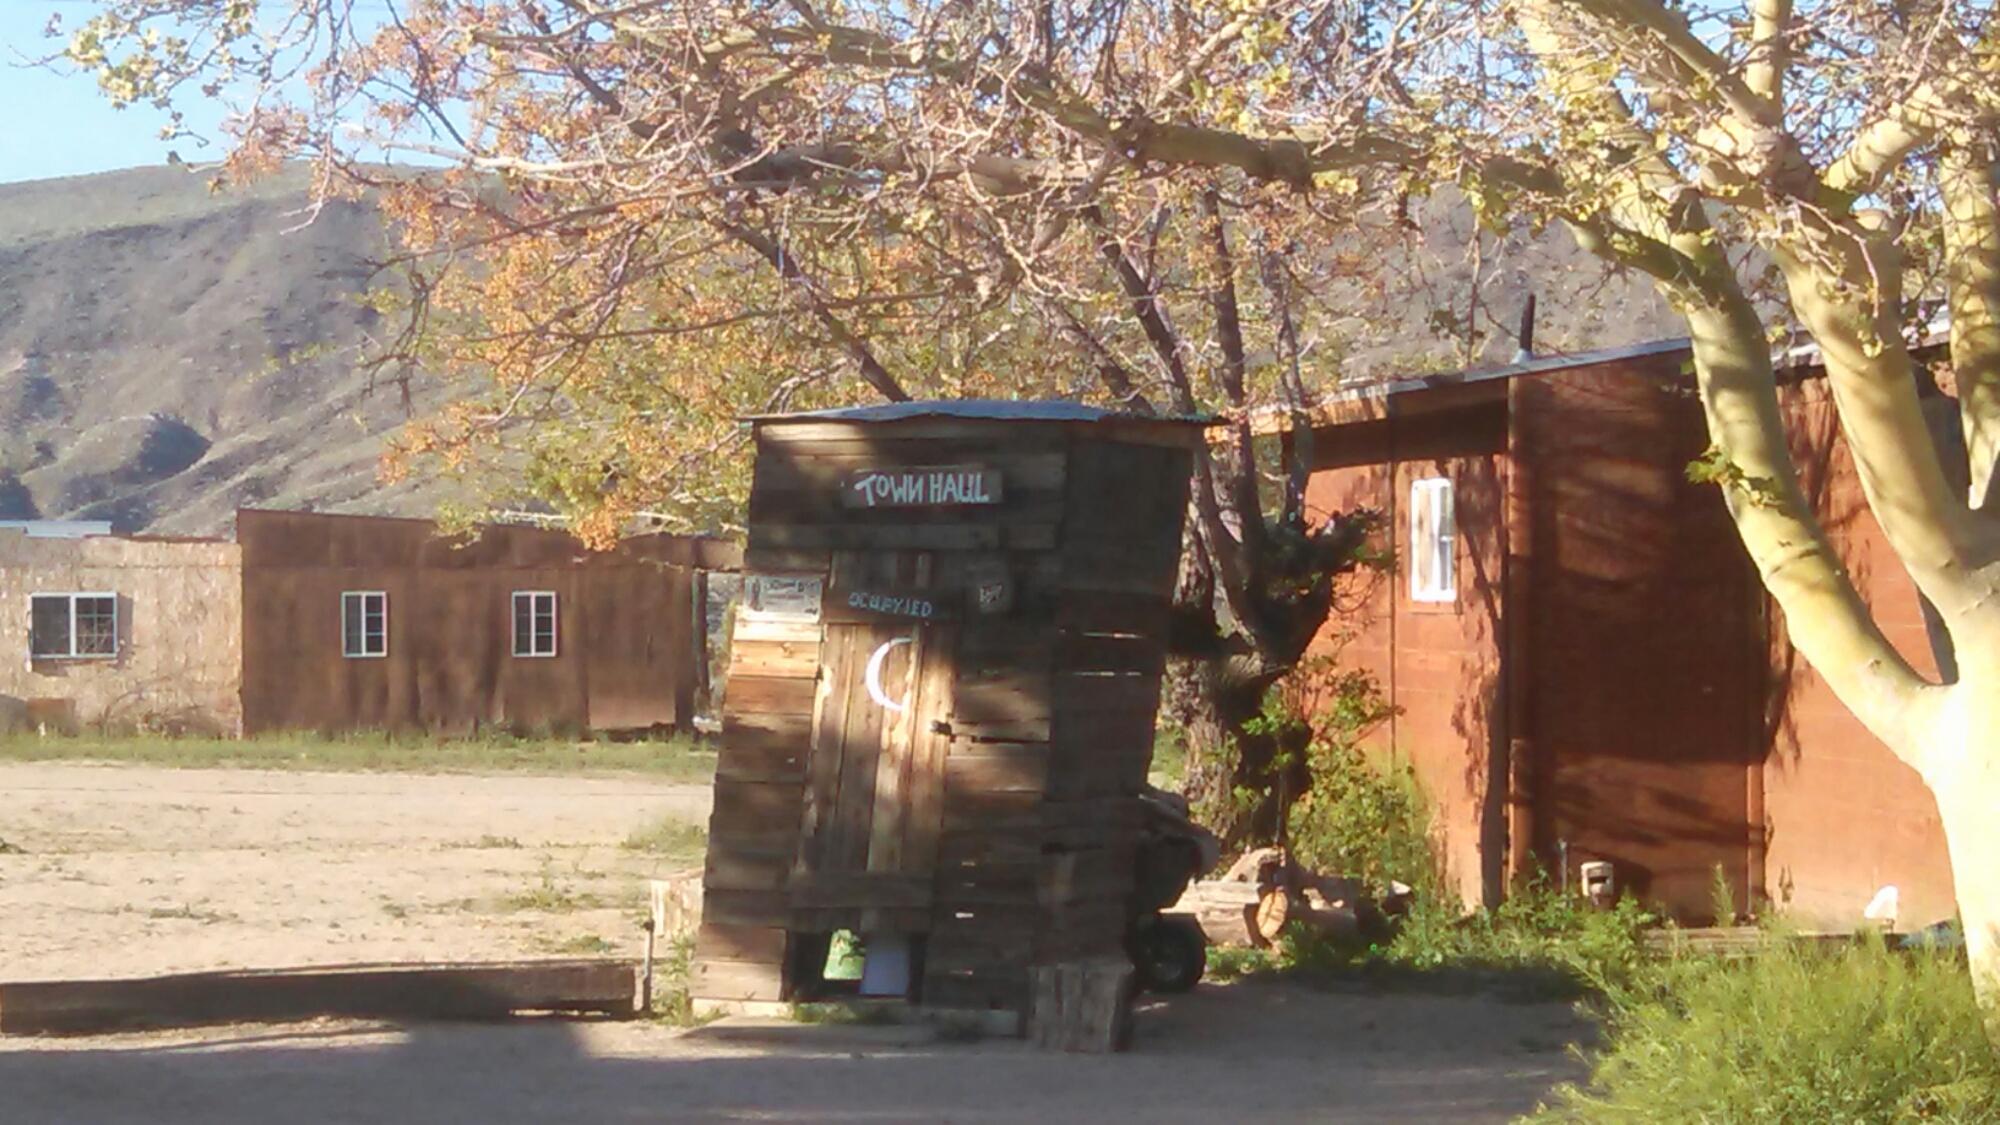 wpid wp 1427040427033 - LFTR - US - CA - Roadside oddities make me happy. Giant Rock, Integratron, Pioneer town